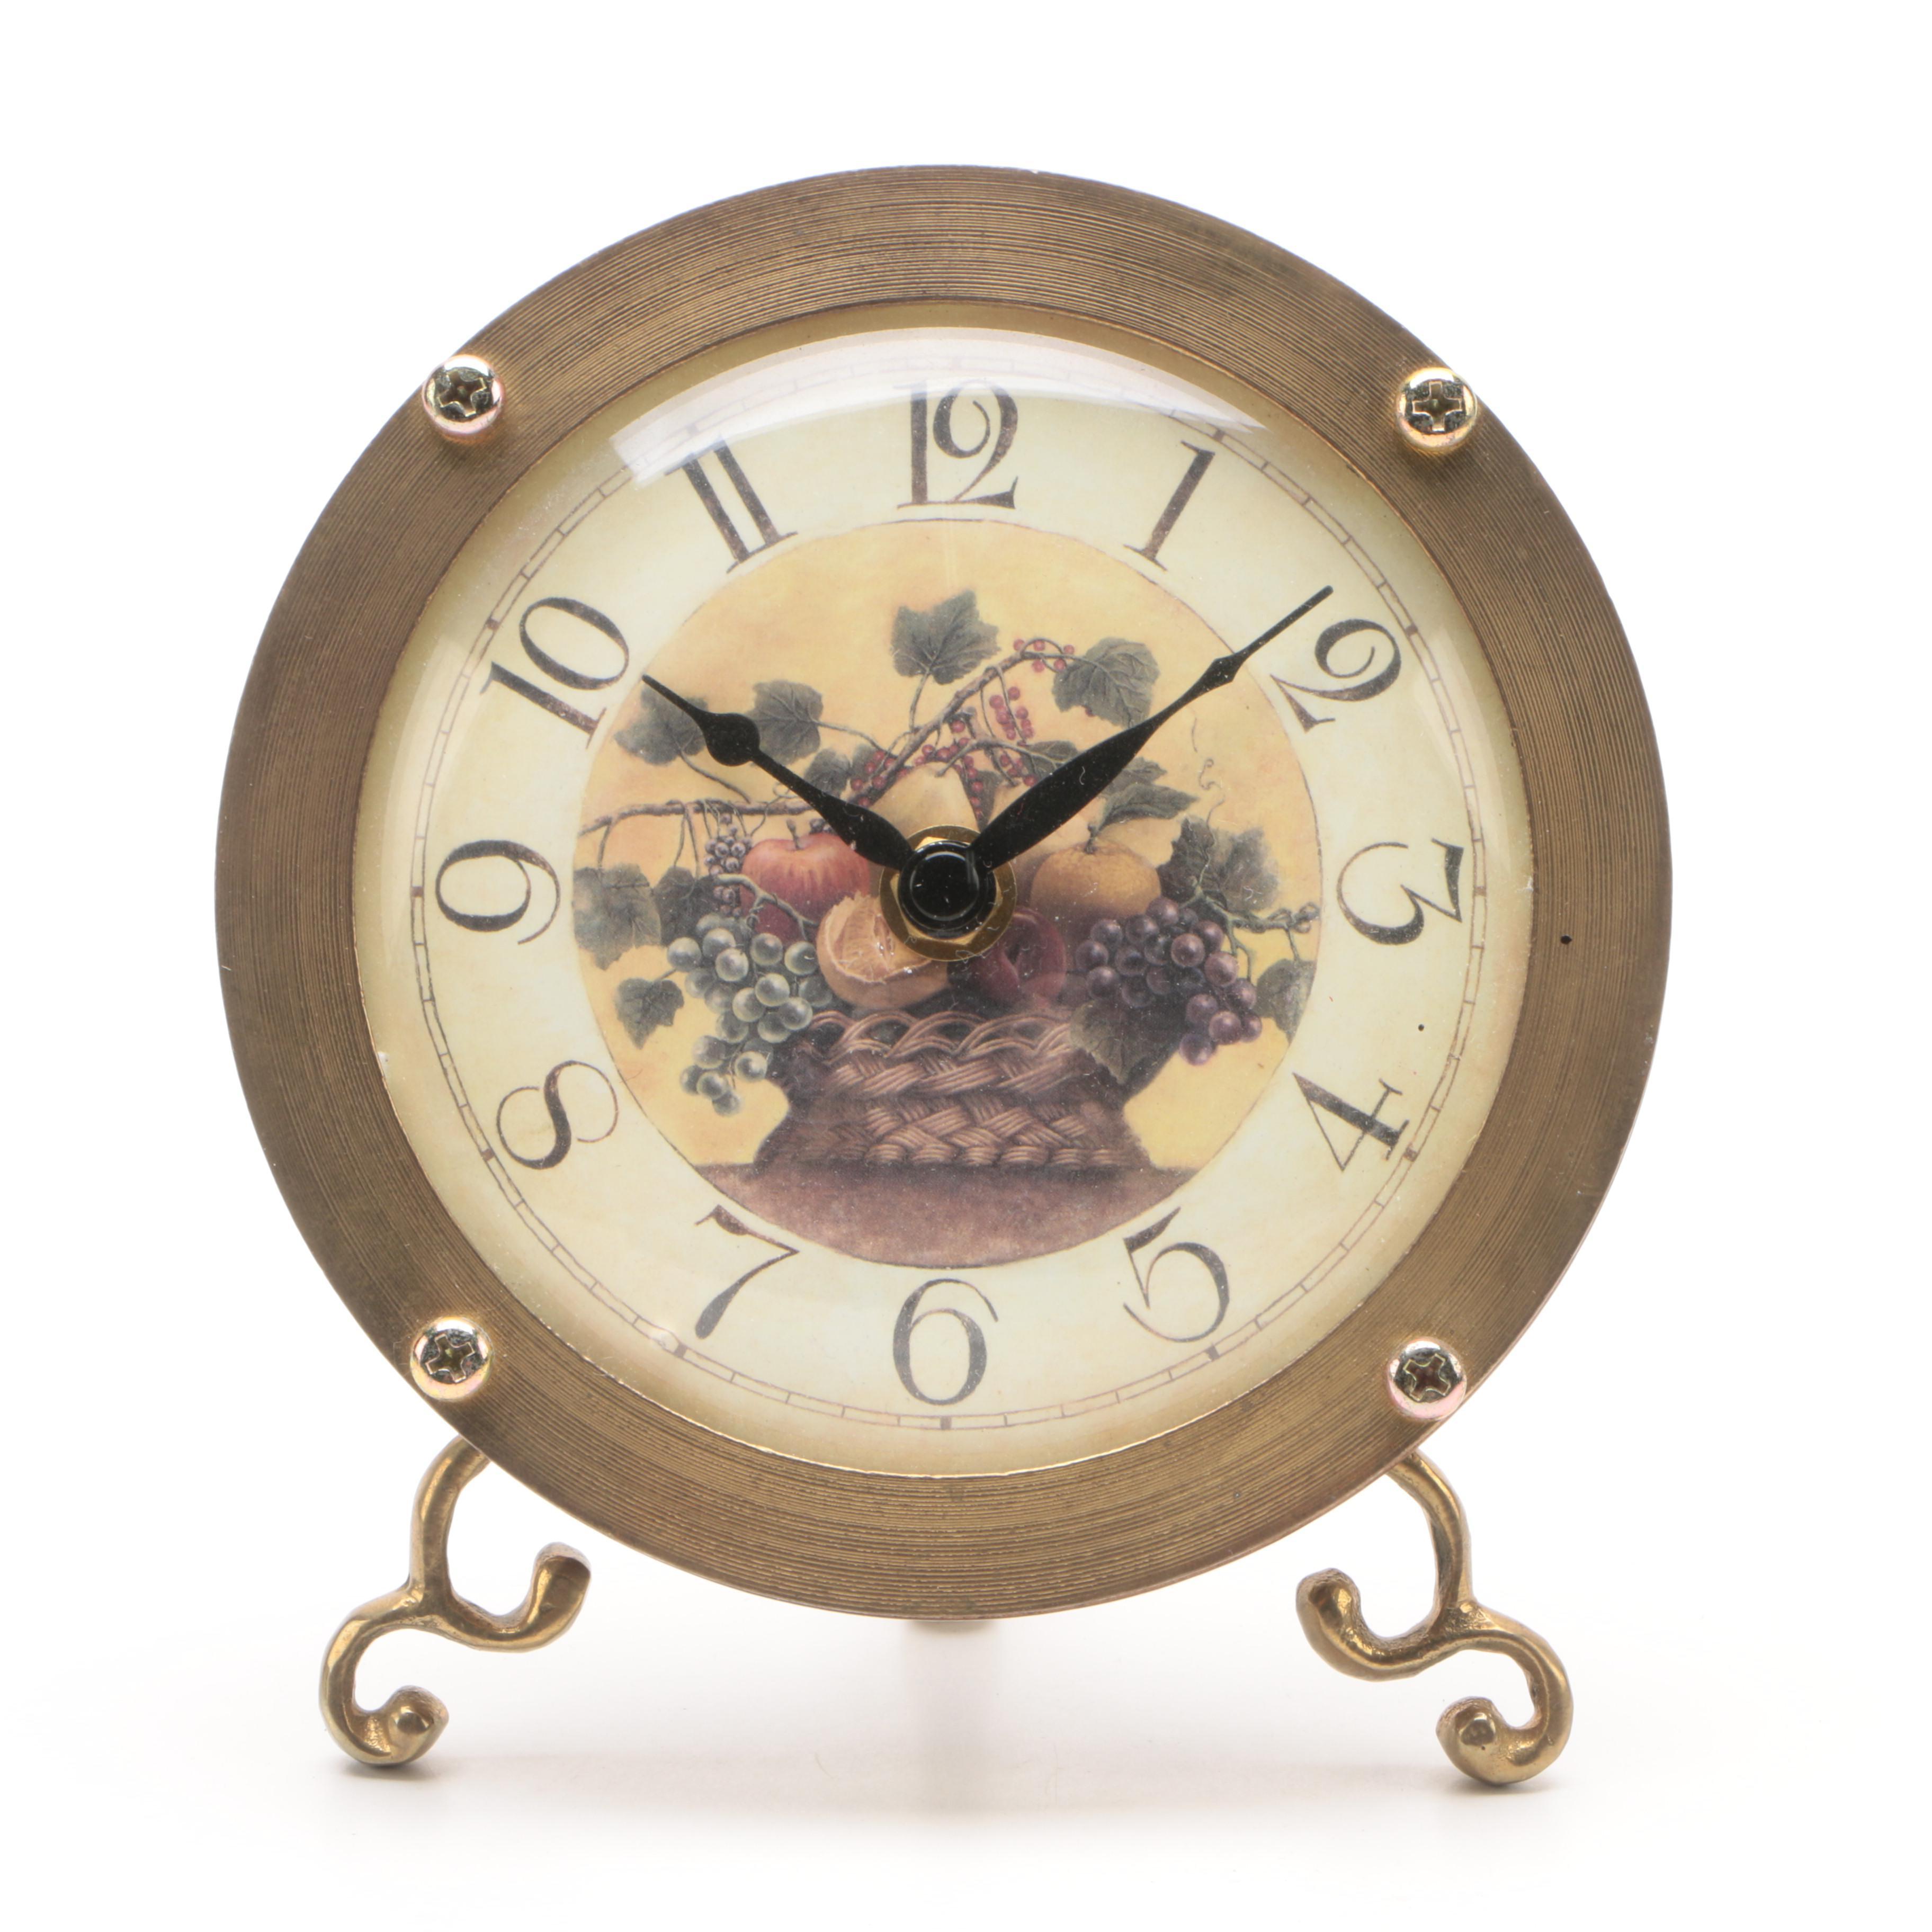 decorative desk clocks agate still life offset lithograph decorative desk clock ebth